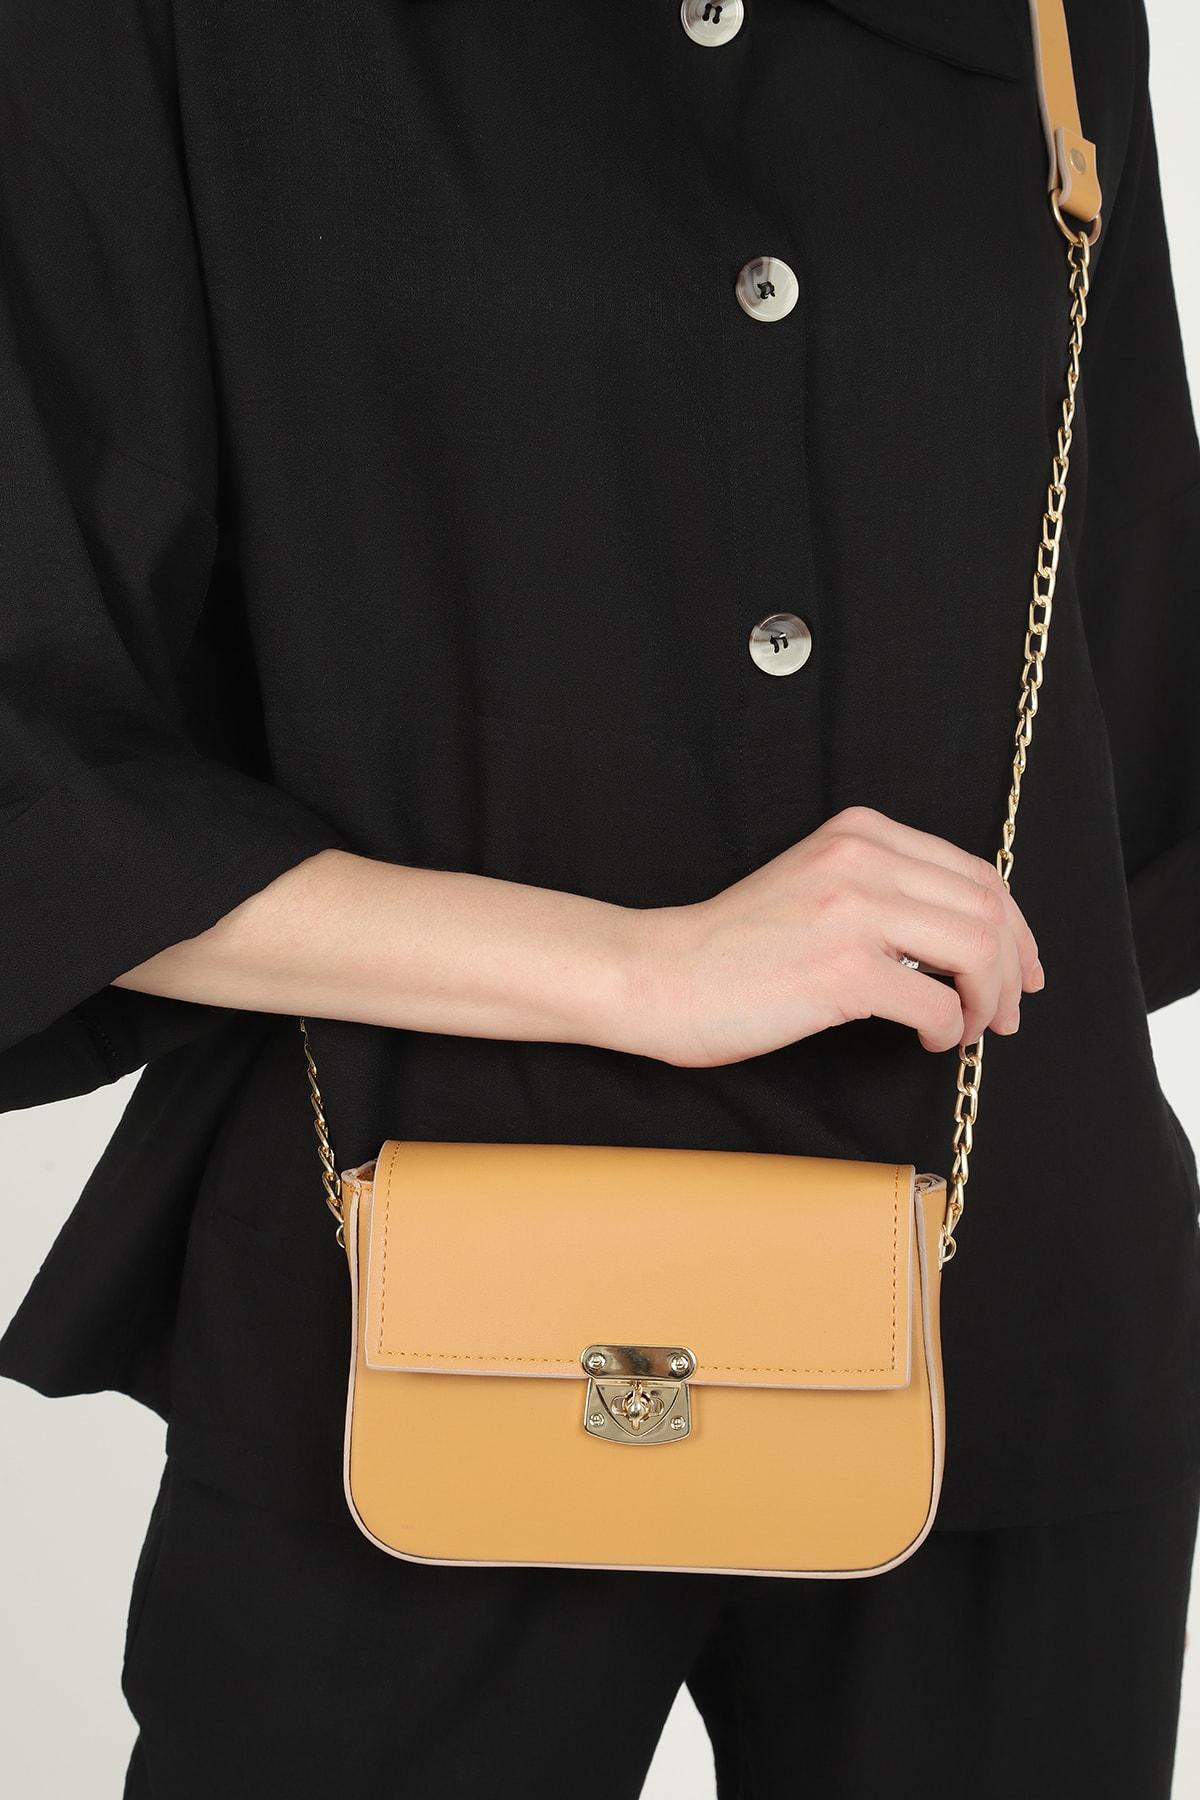 QOOL WOMEN Kadın Çanta Mini Baget 1